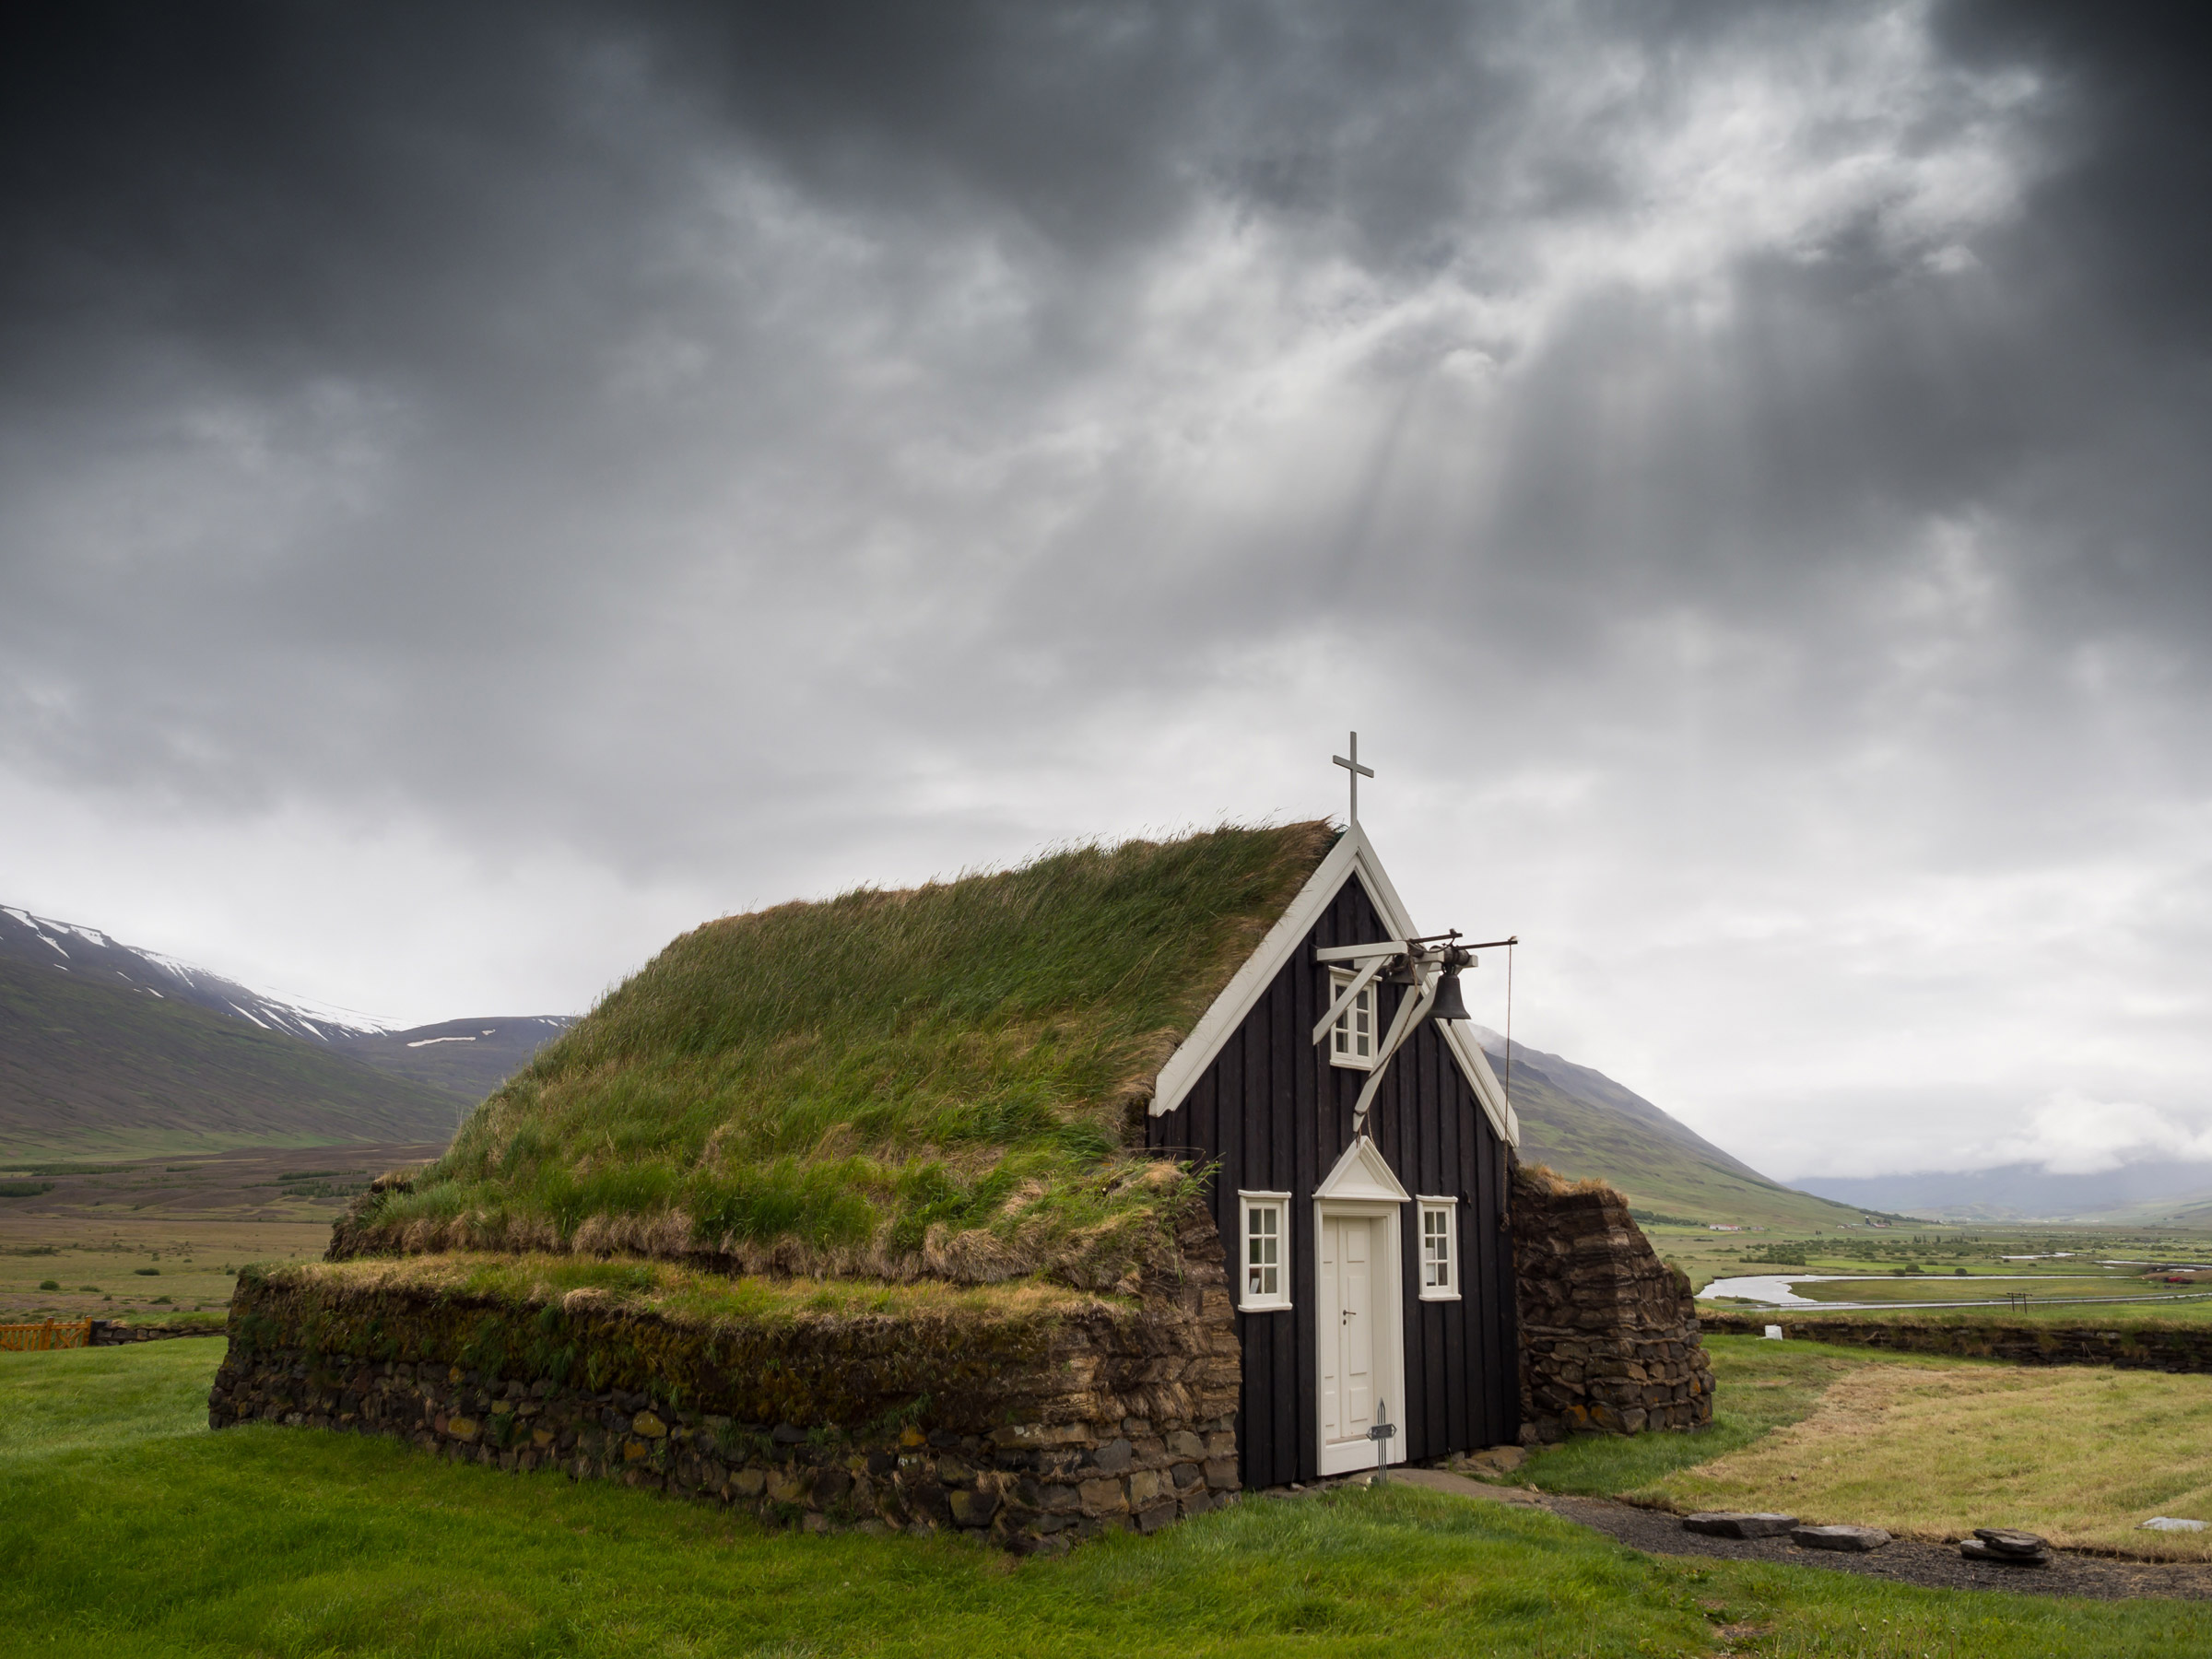 rustic church in iceland